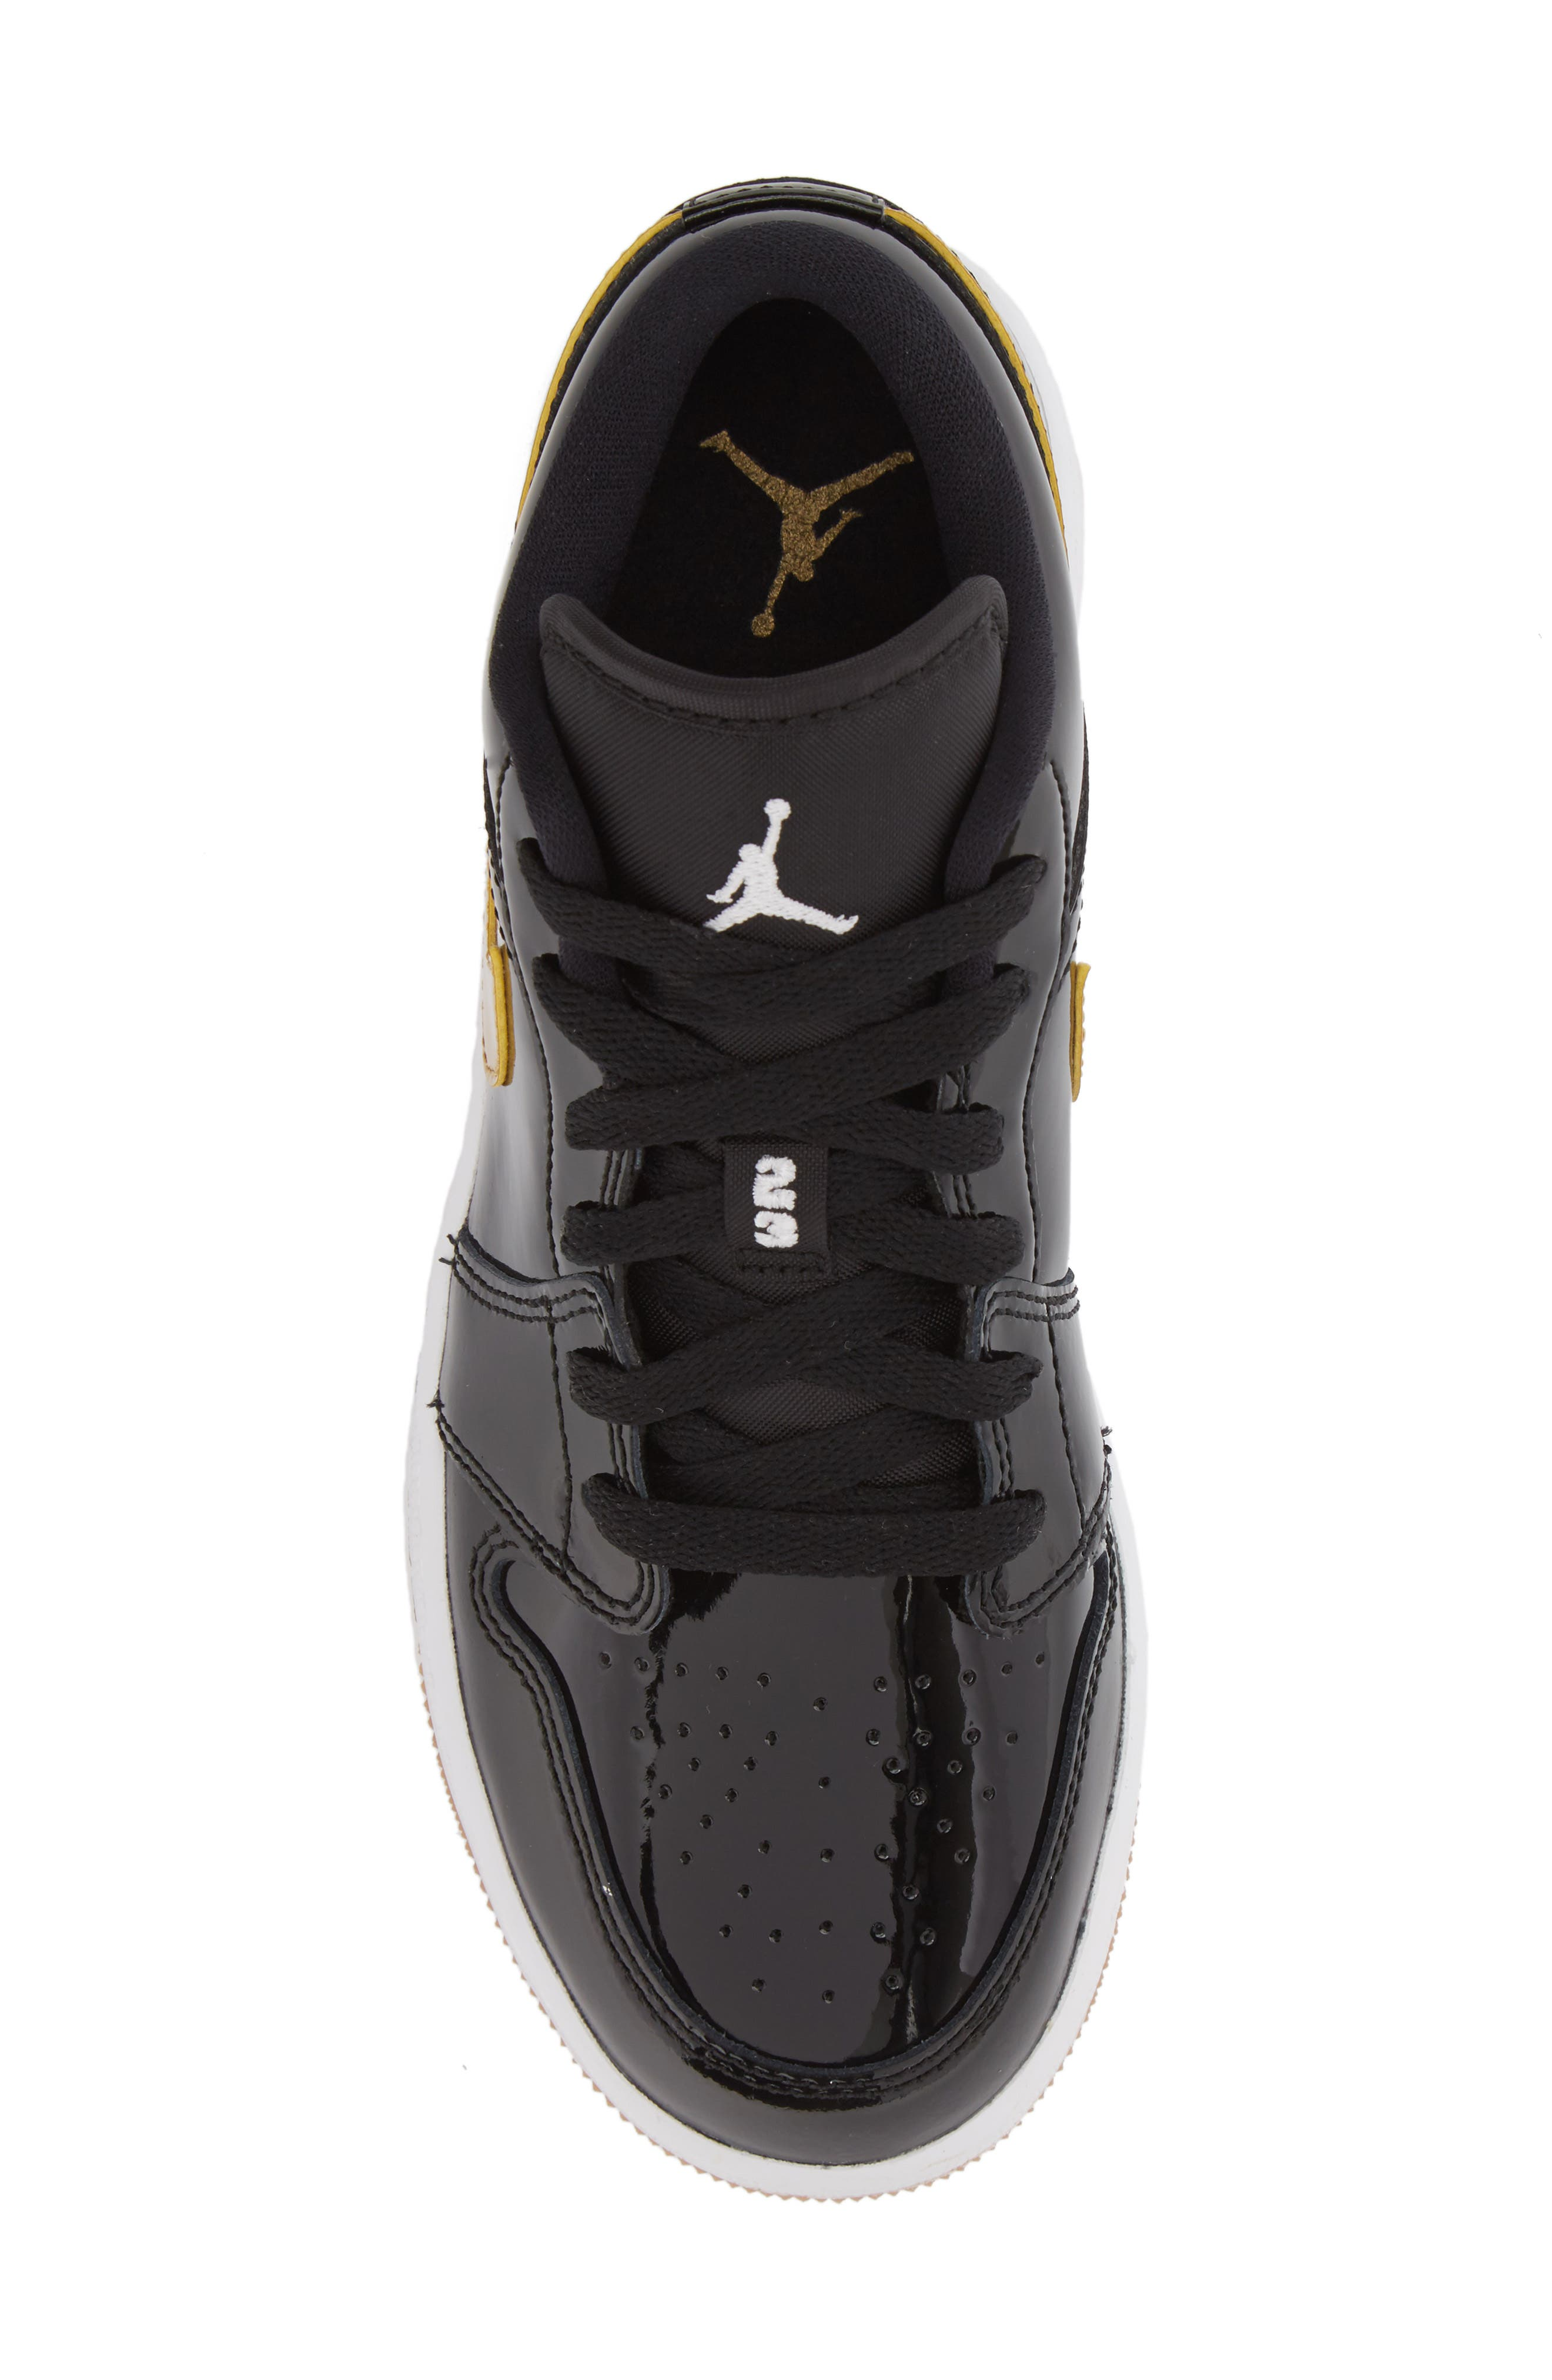 Nike 'Jordan 1 Low' Basketball Shoe,                             Alternate thumbnail 5, color,                             Black/ Metallic Gold/ White